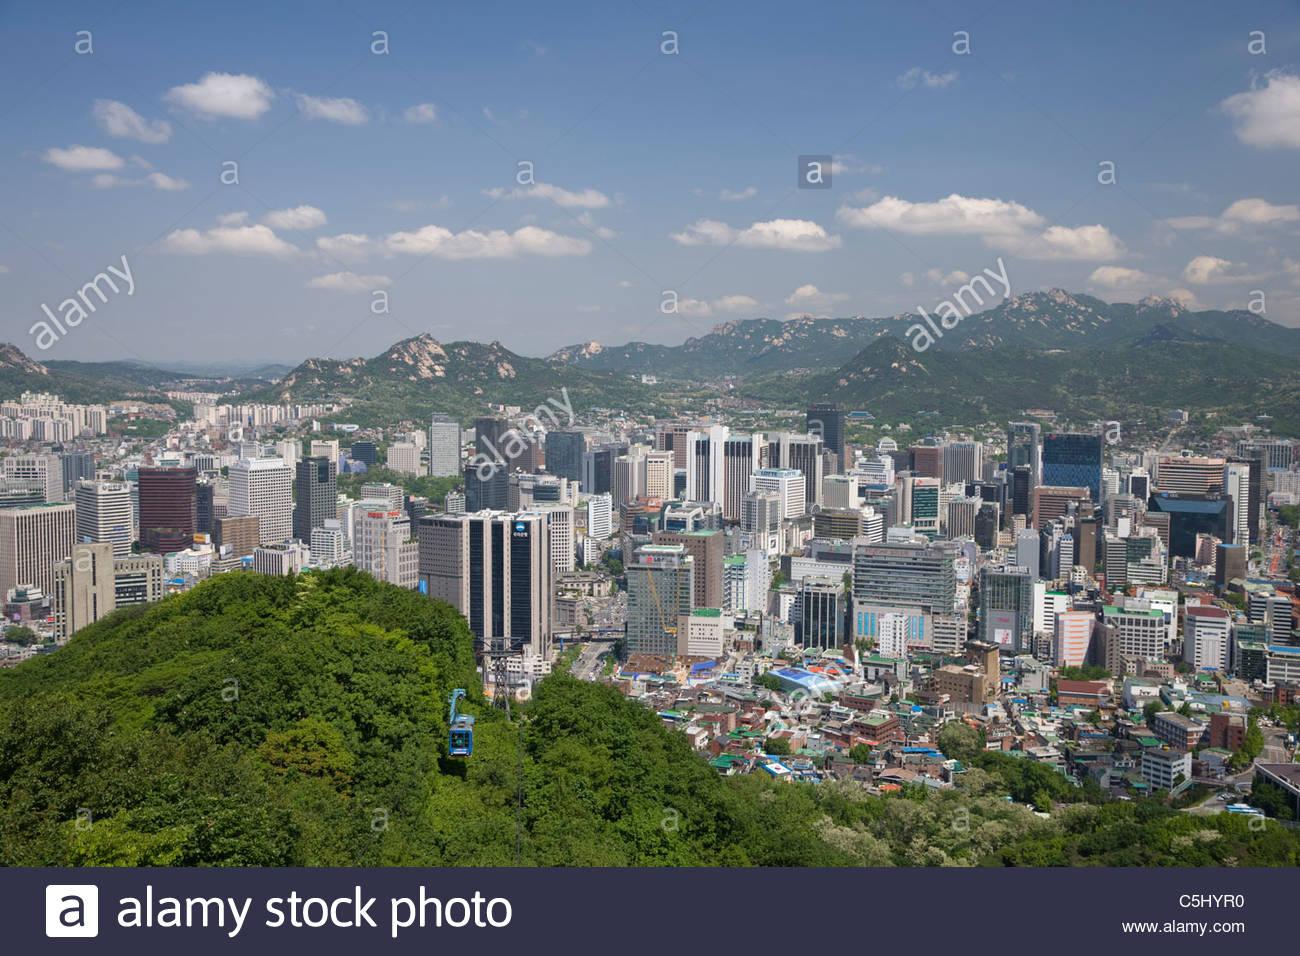 Namsan cable car - Namsan Cable Car View From Namsan Vehicle Transportation Seoul South Korea Asia